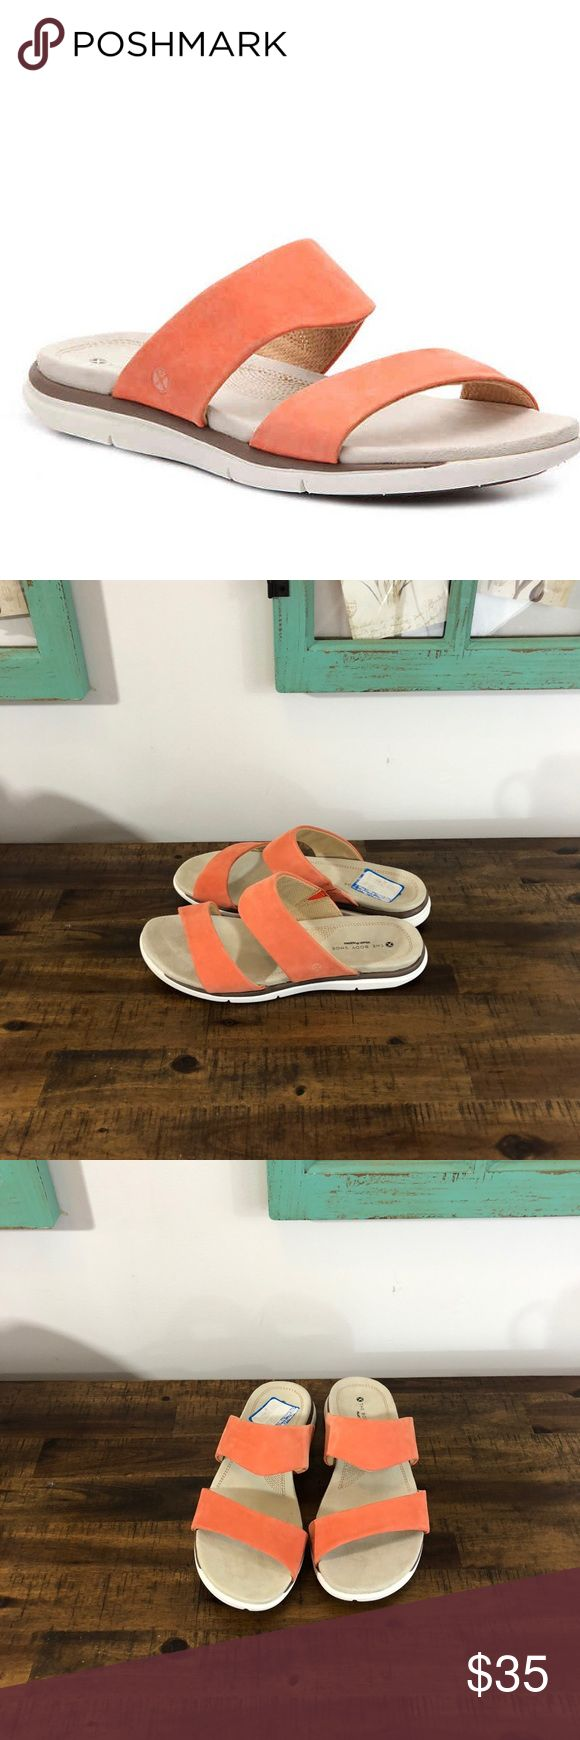 I just added this listing on Poshmark: NWT Hush Puppies Reo Aida sandals. #shopmycloset #poshmark #fashion #shopping #style #forsale #Hush Puppies #Shoes